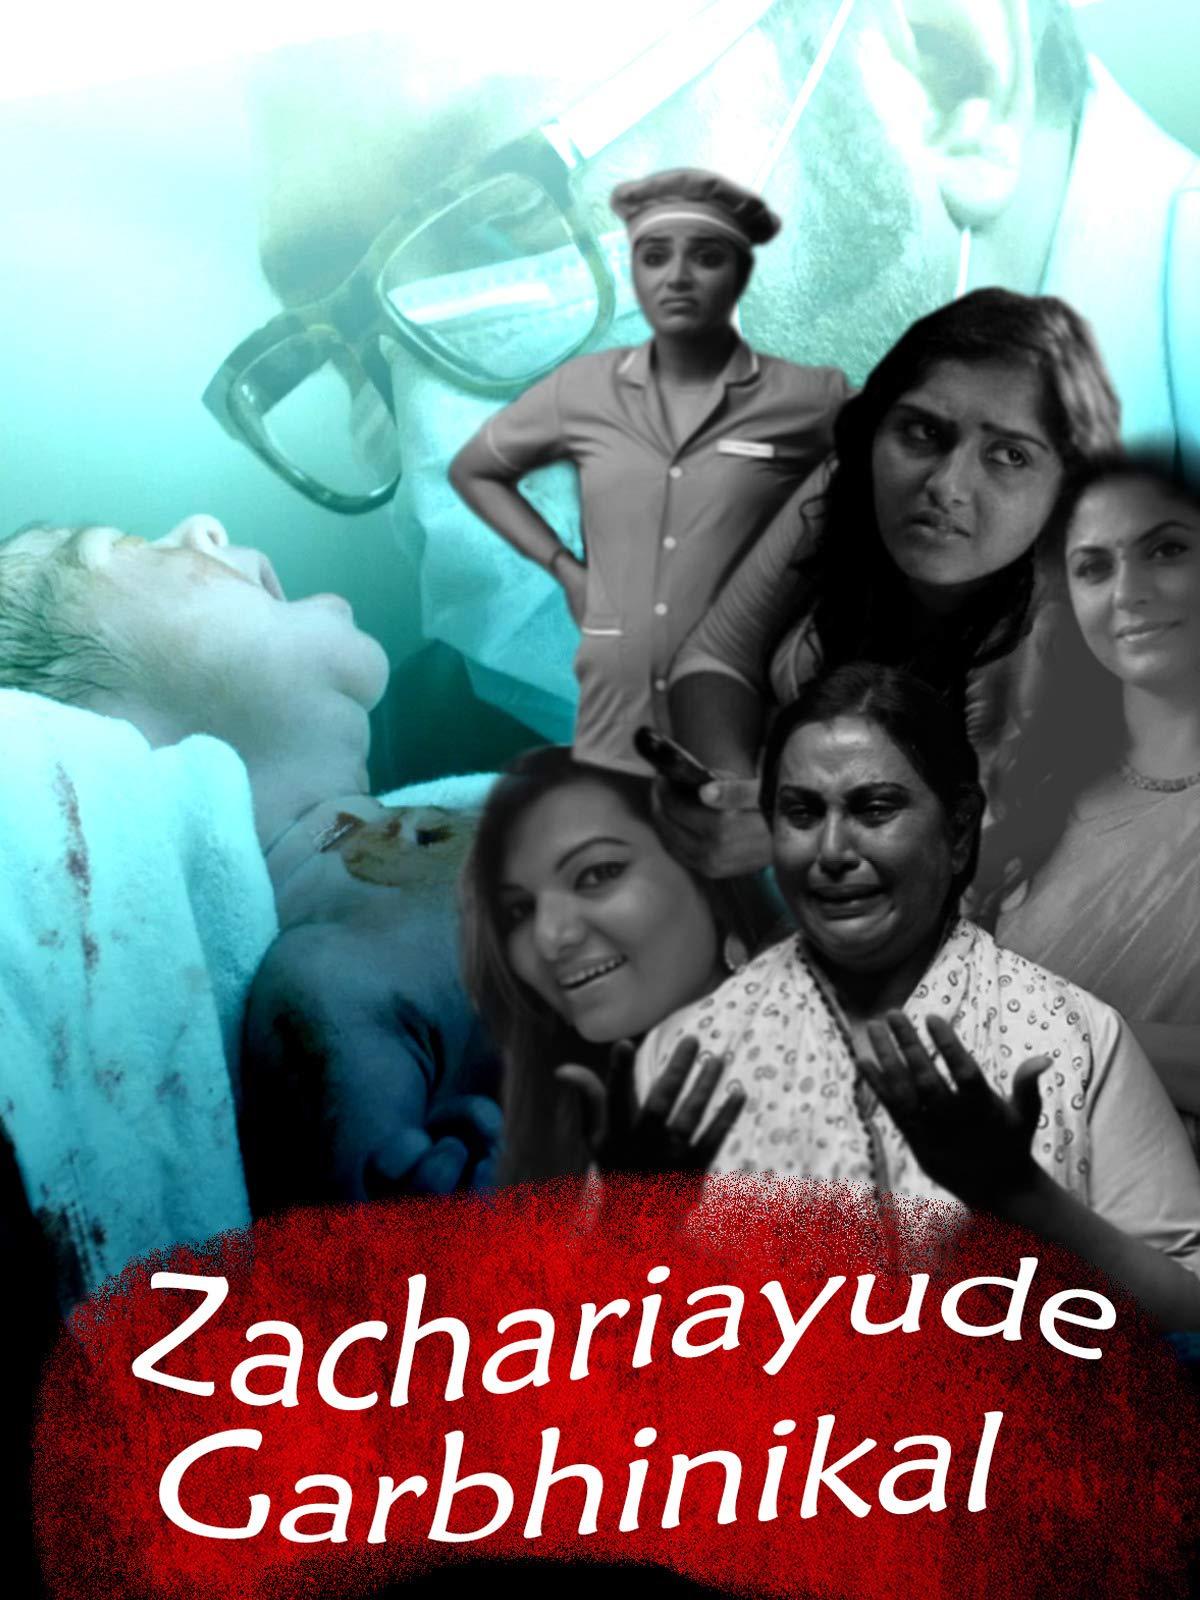 Zachariayude Garbhinikal